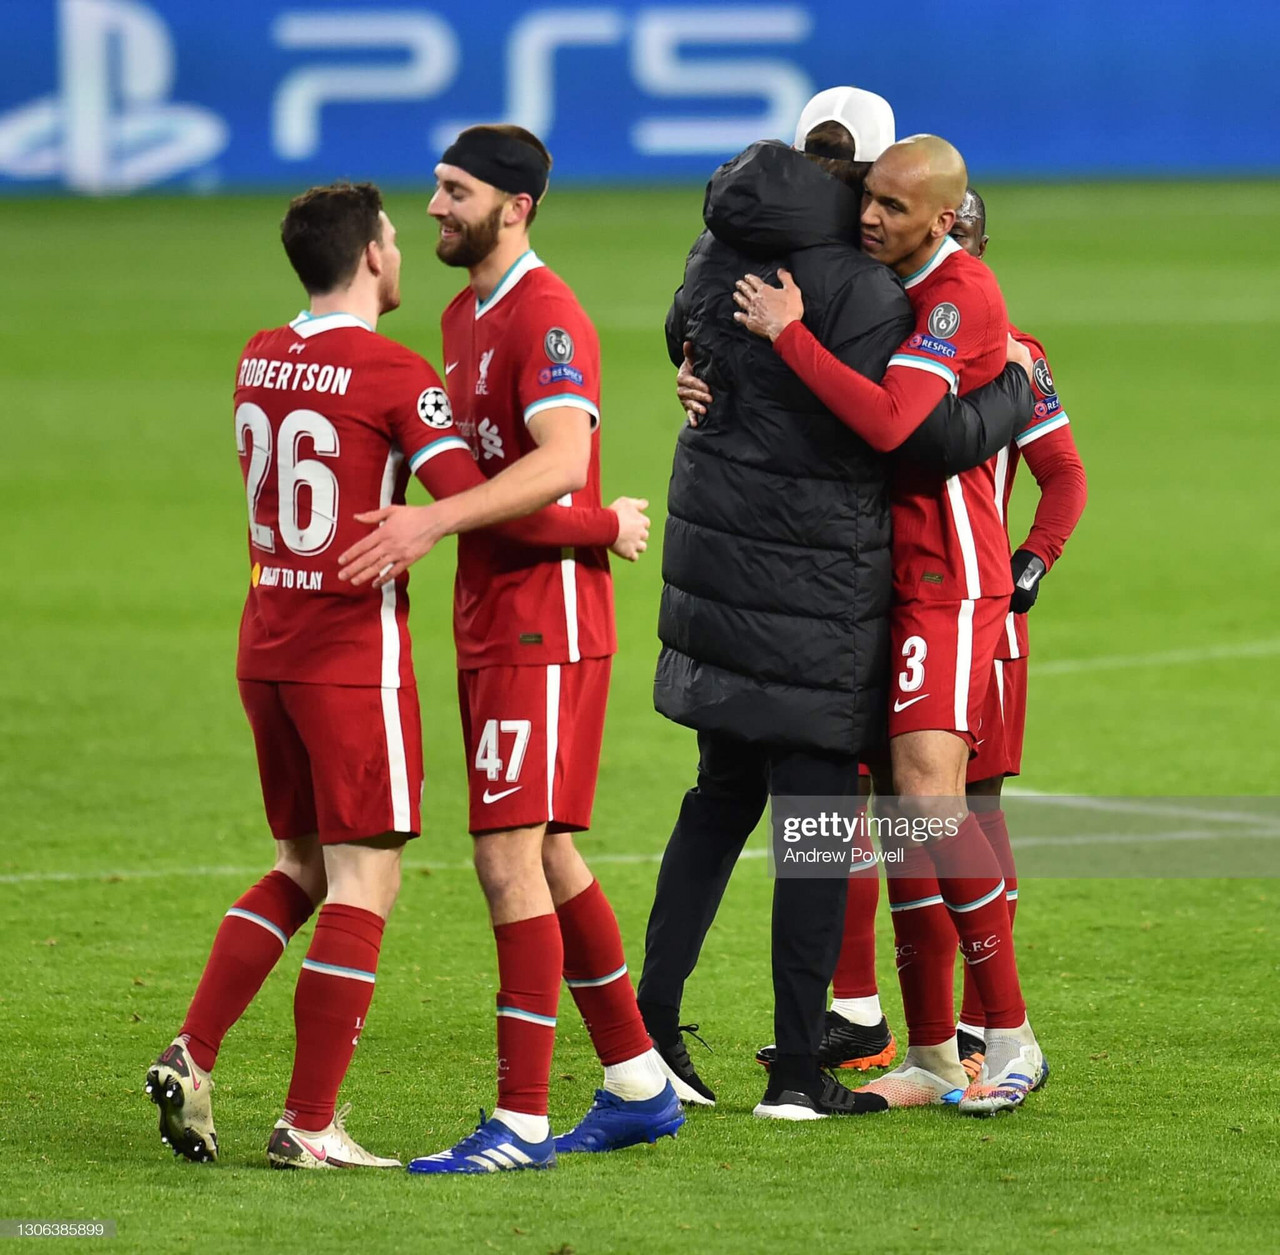 The Warm Down: Reds reach Champions League quarter-finals